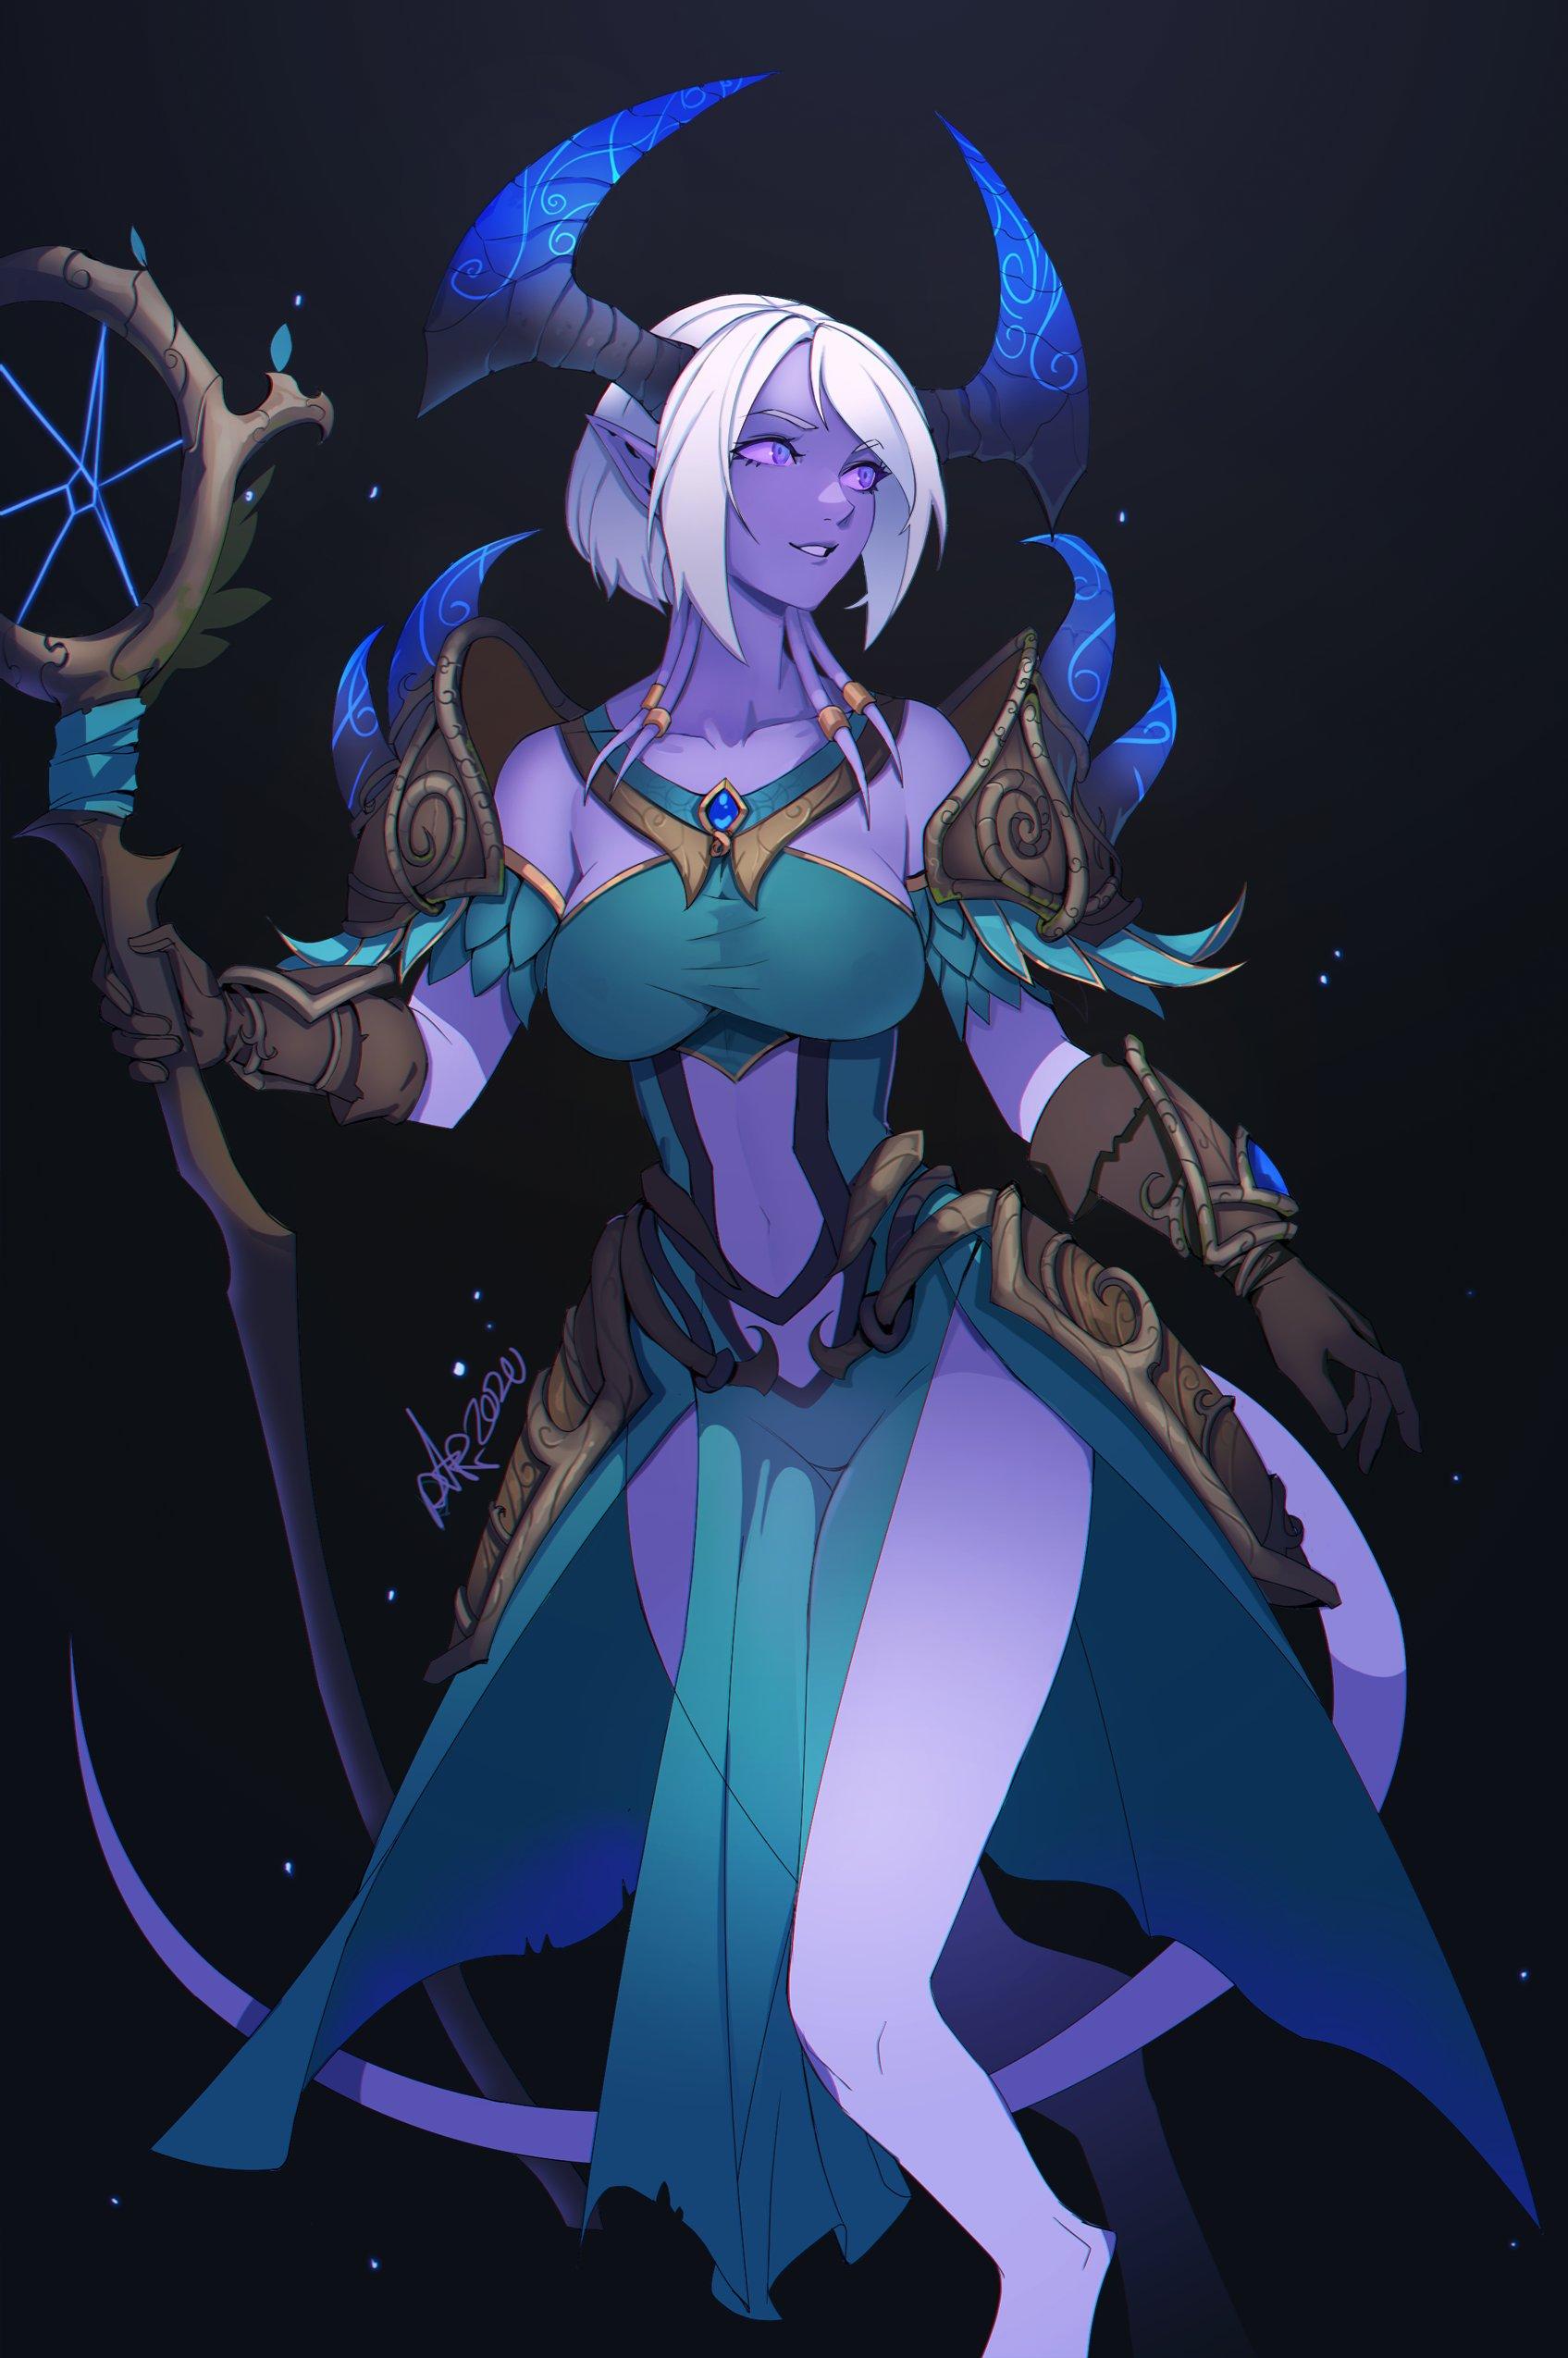 Warcraft World Of Warcraft Blizzard Entertainment Women Fantasy Girl White Hair Purple Eyes Elf Ears 1695x2549